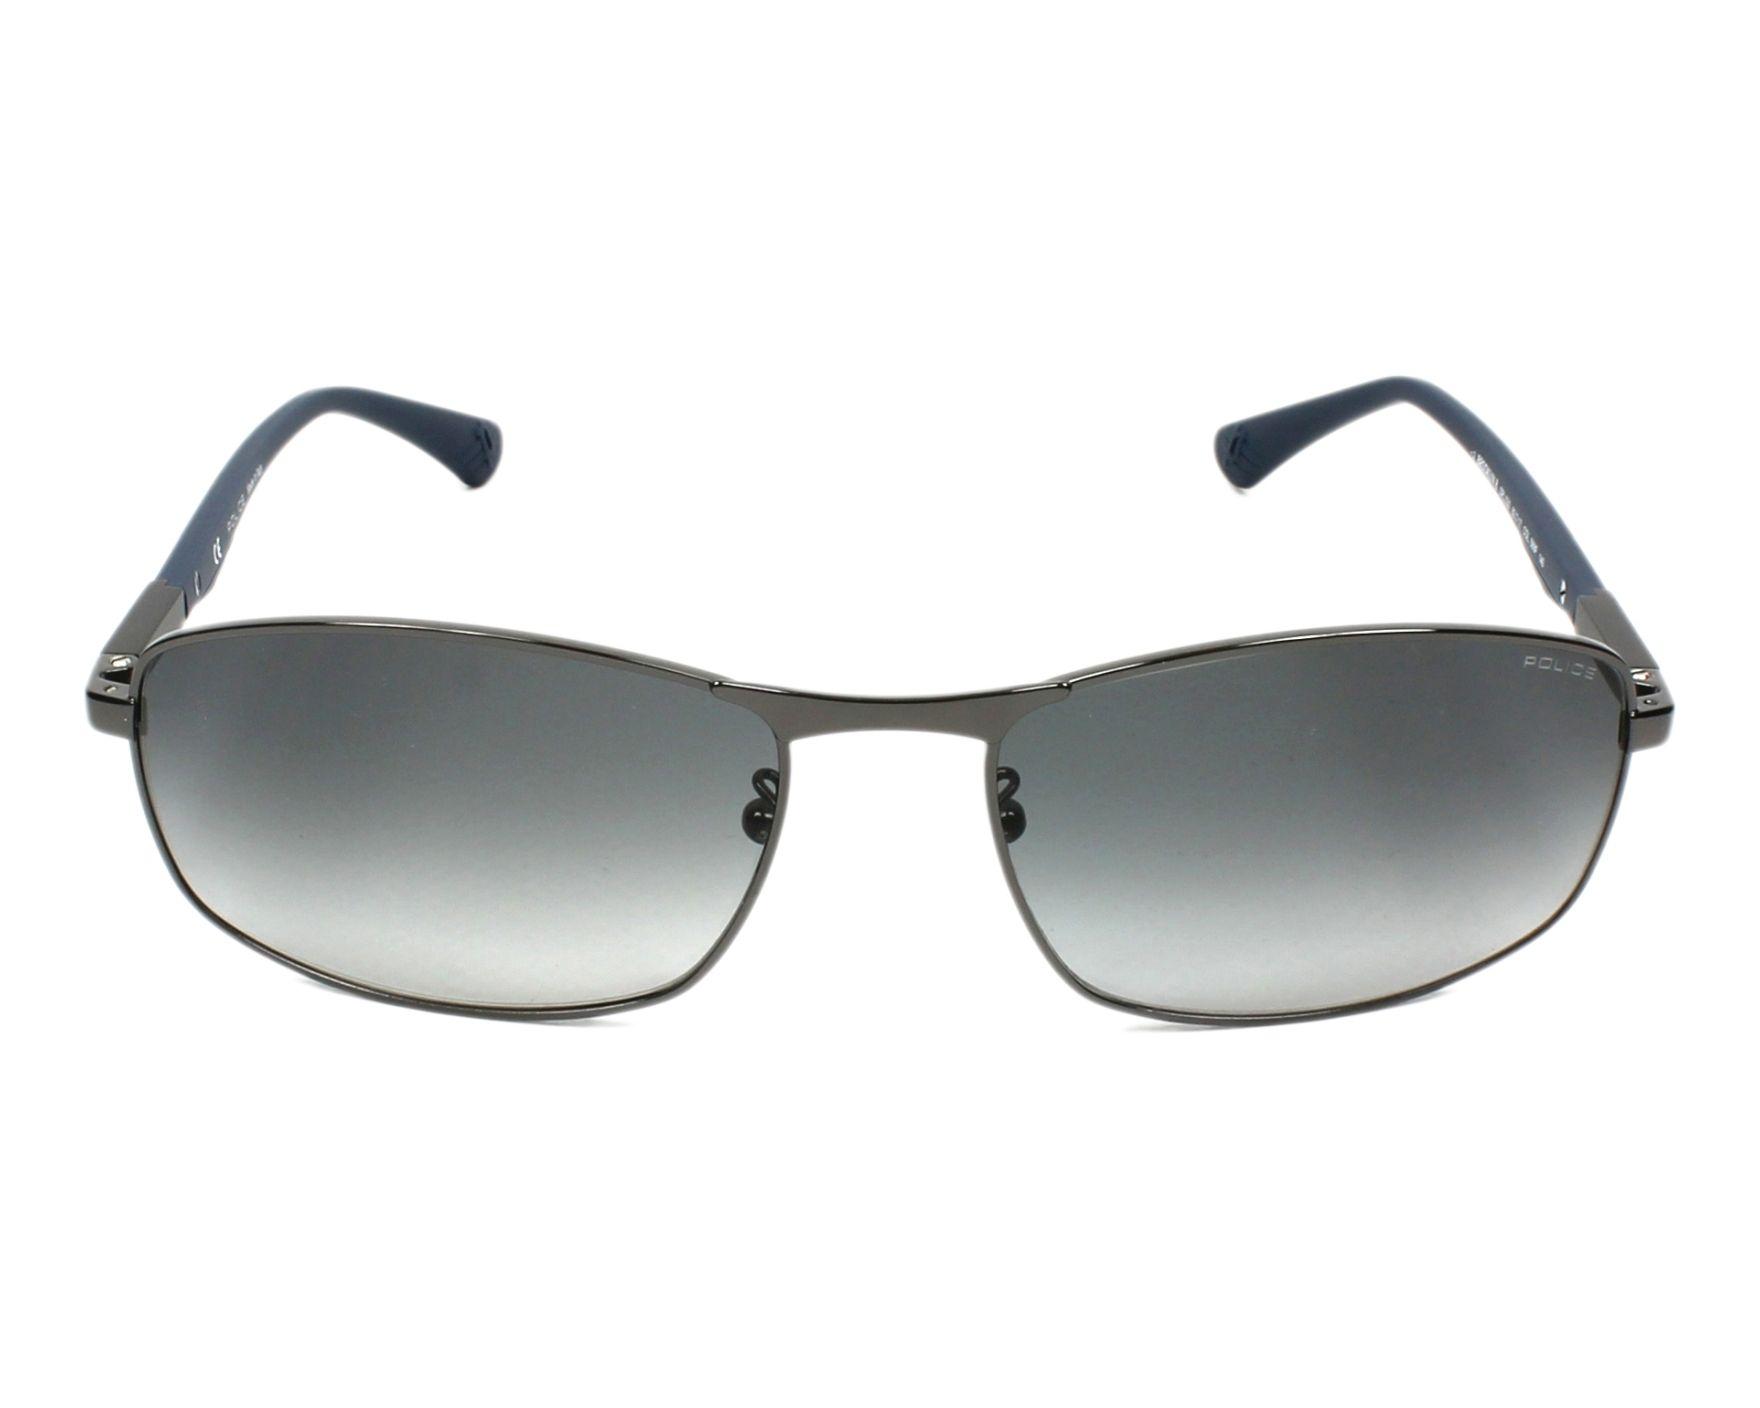 3eae97dd238 Sunglasses Police SPL-530 568F 60-17 Gun Blue front view